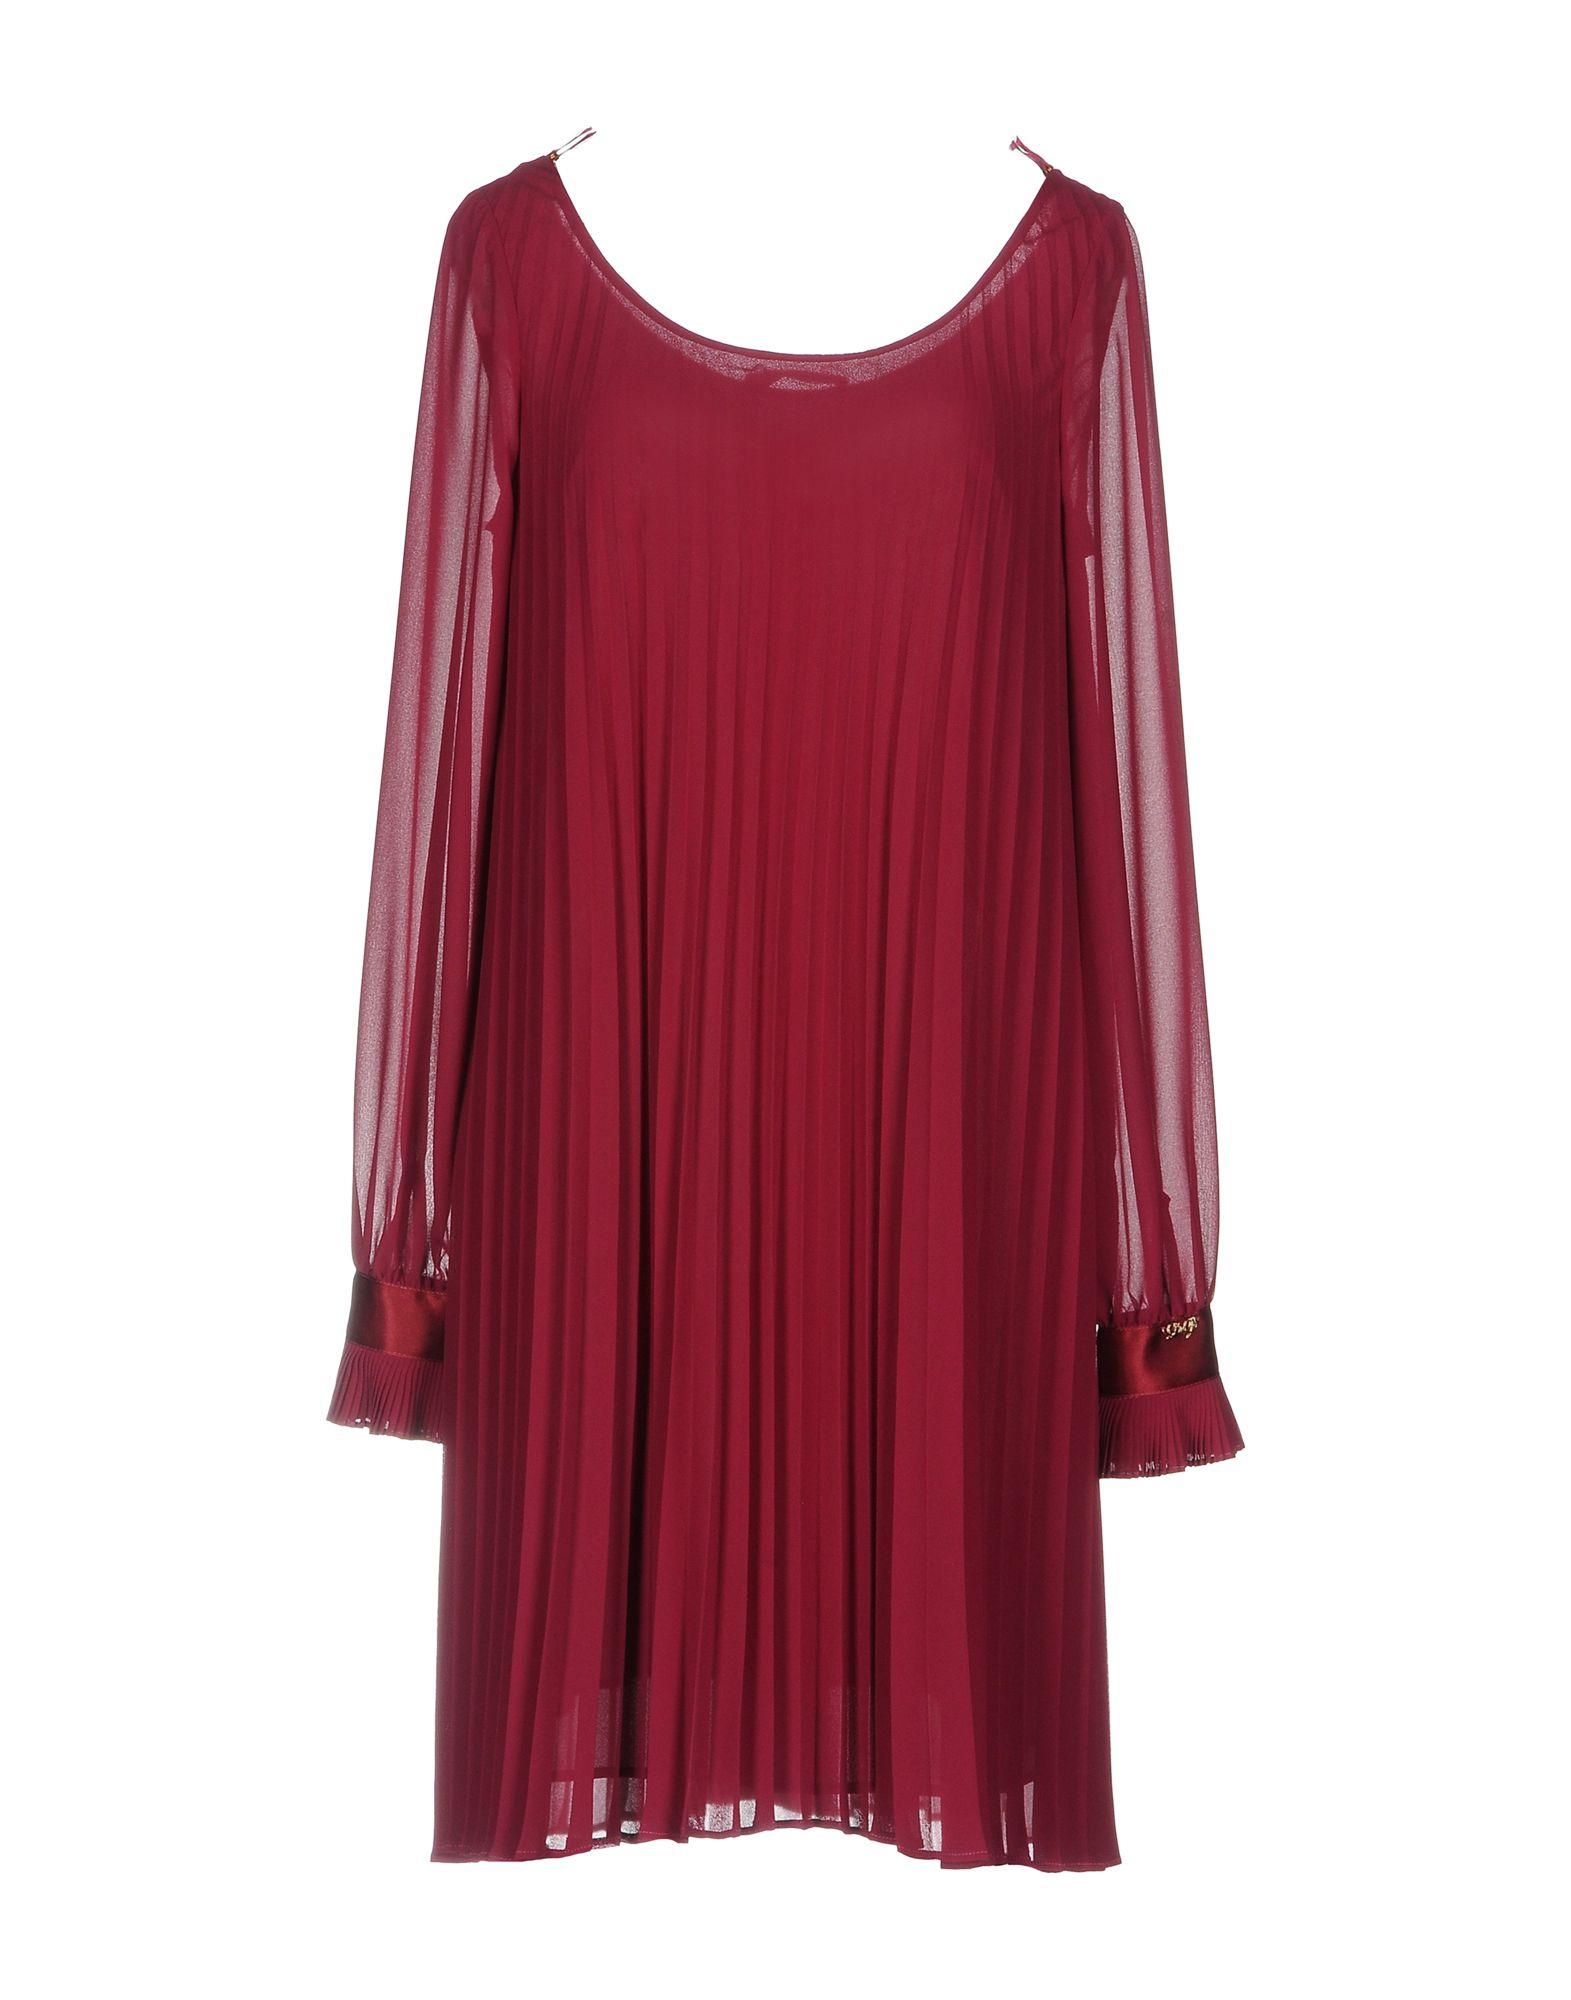 LES COCKTAILS DE LIU •JO Damen Kurzes Kleid Farbe Purpur Größe 4